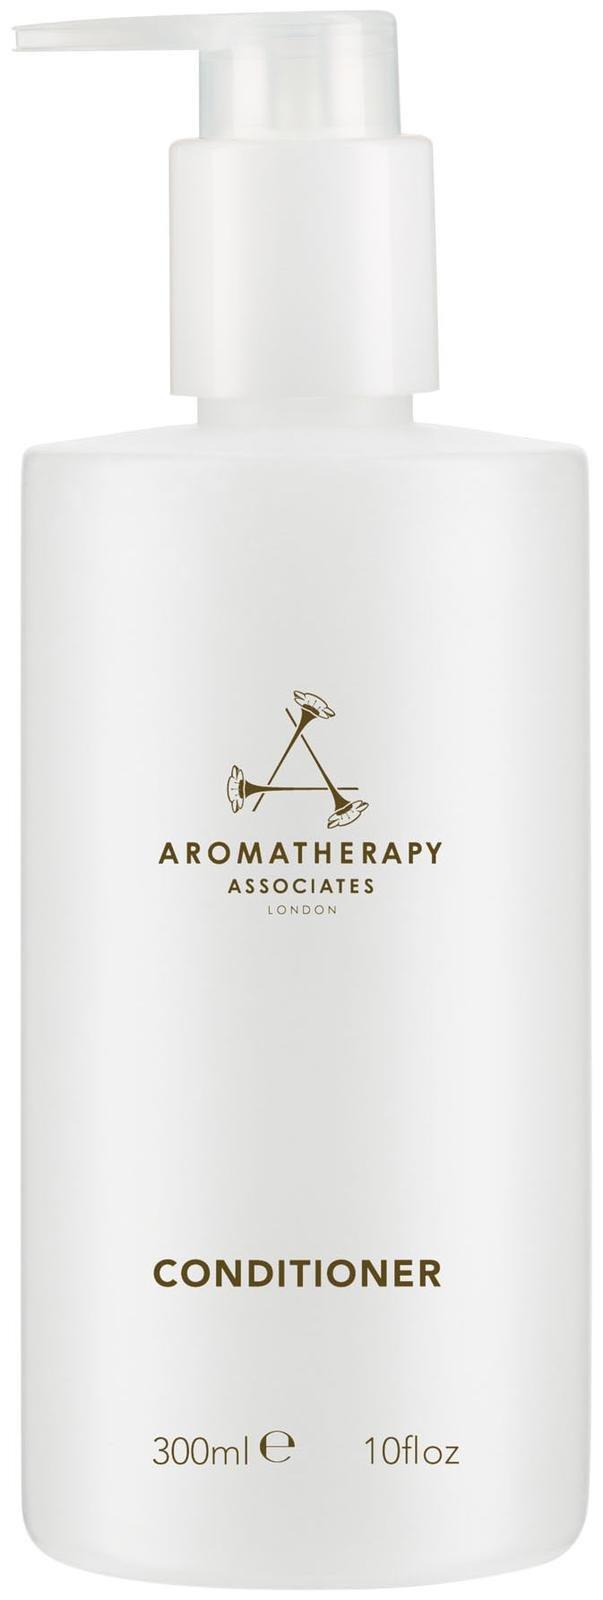 Aromatherapy Associates Balance Conditioner